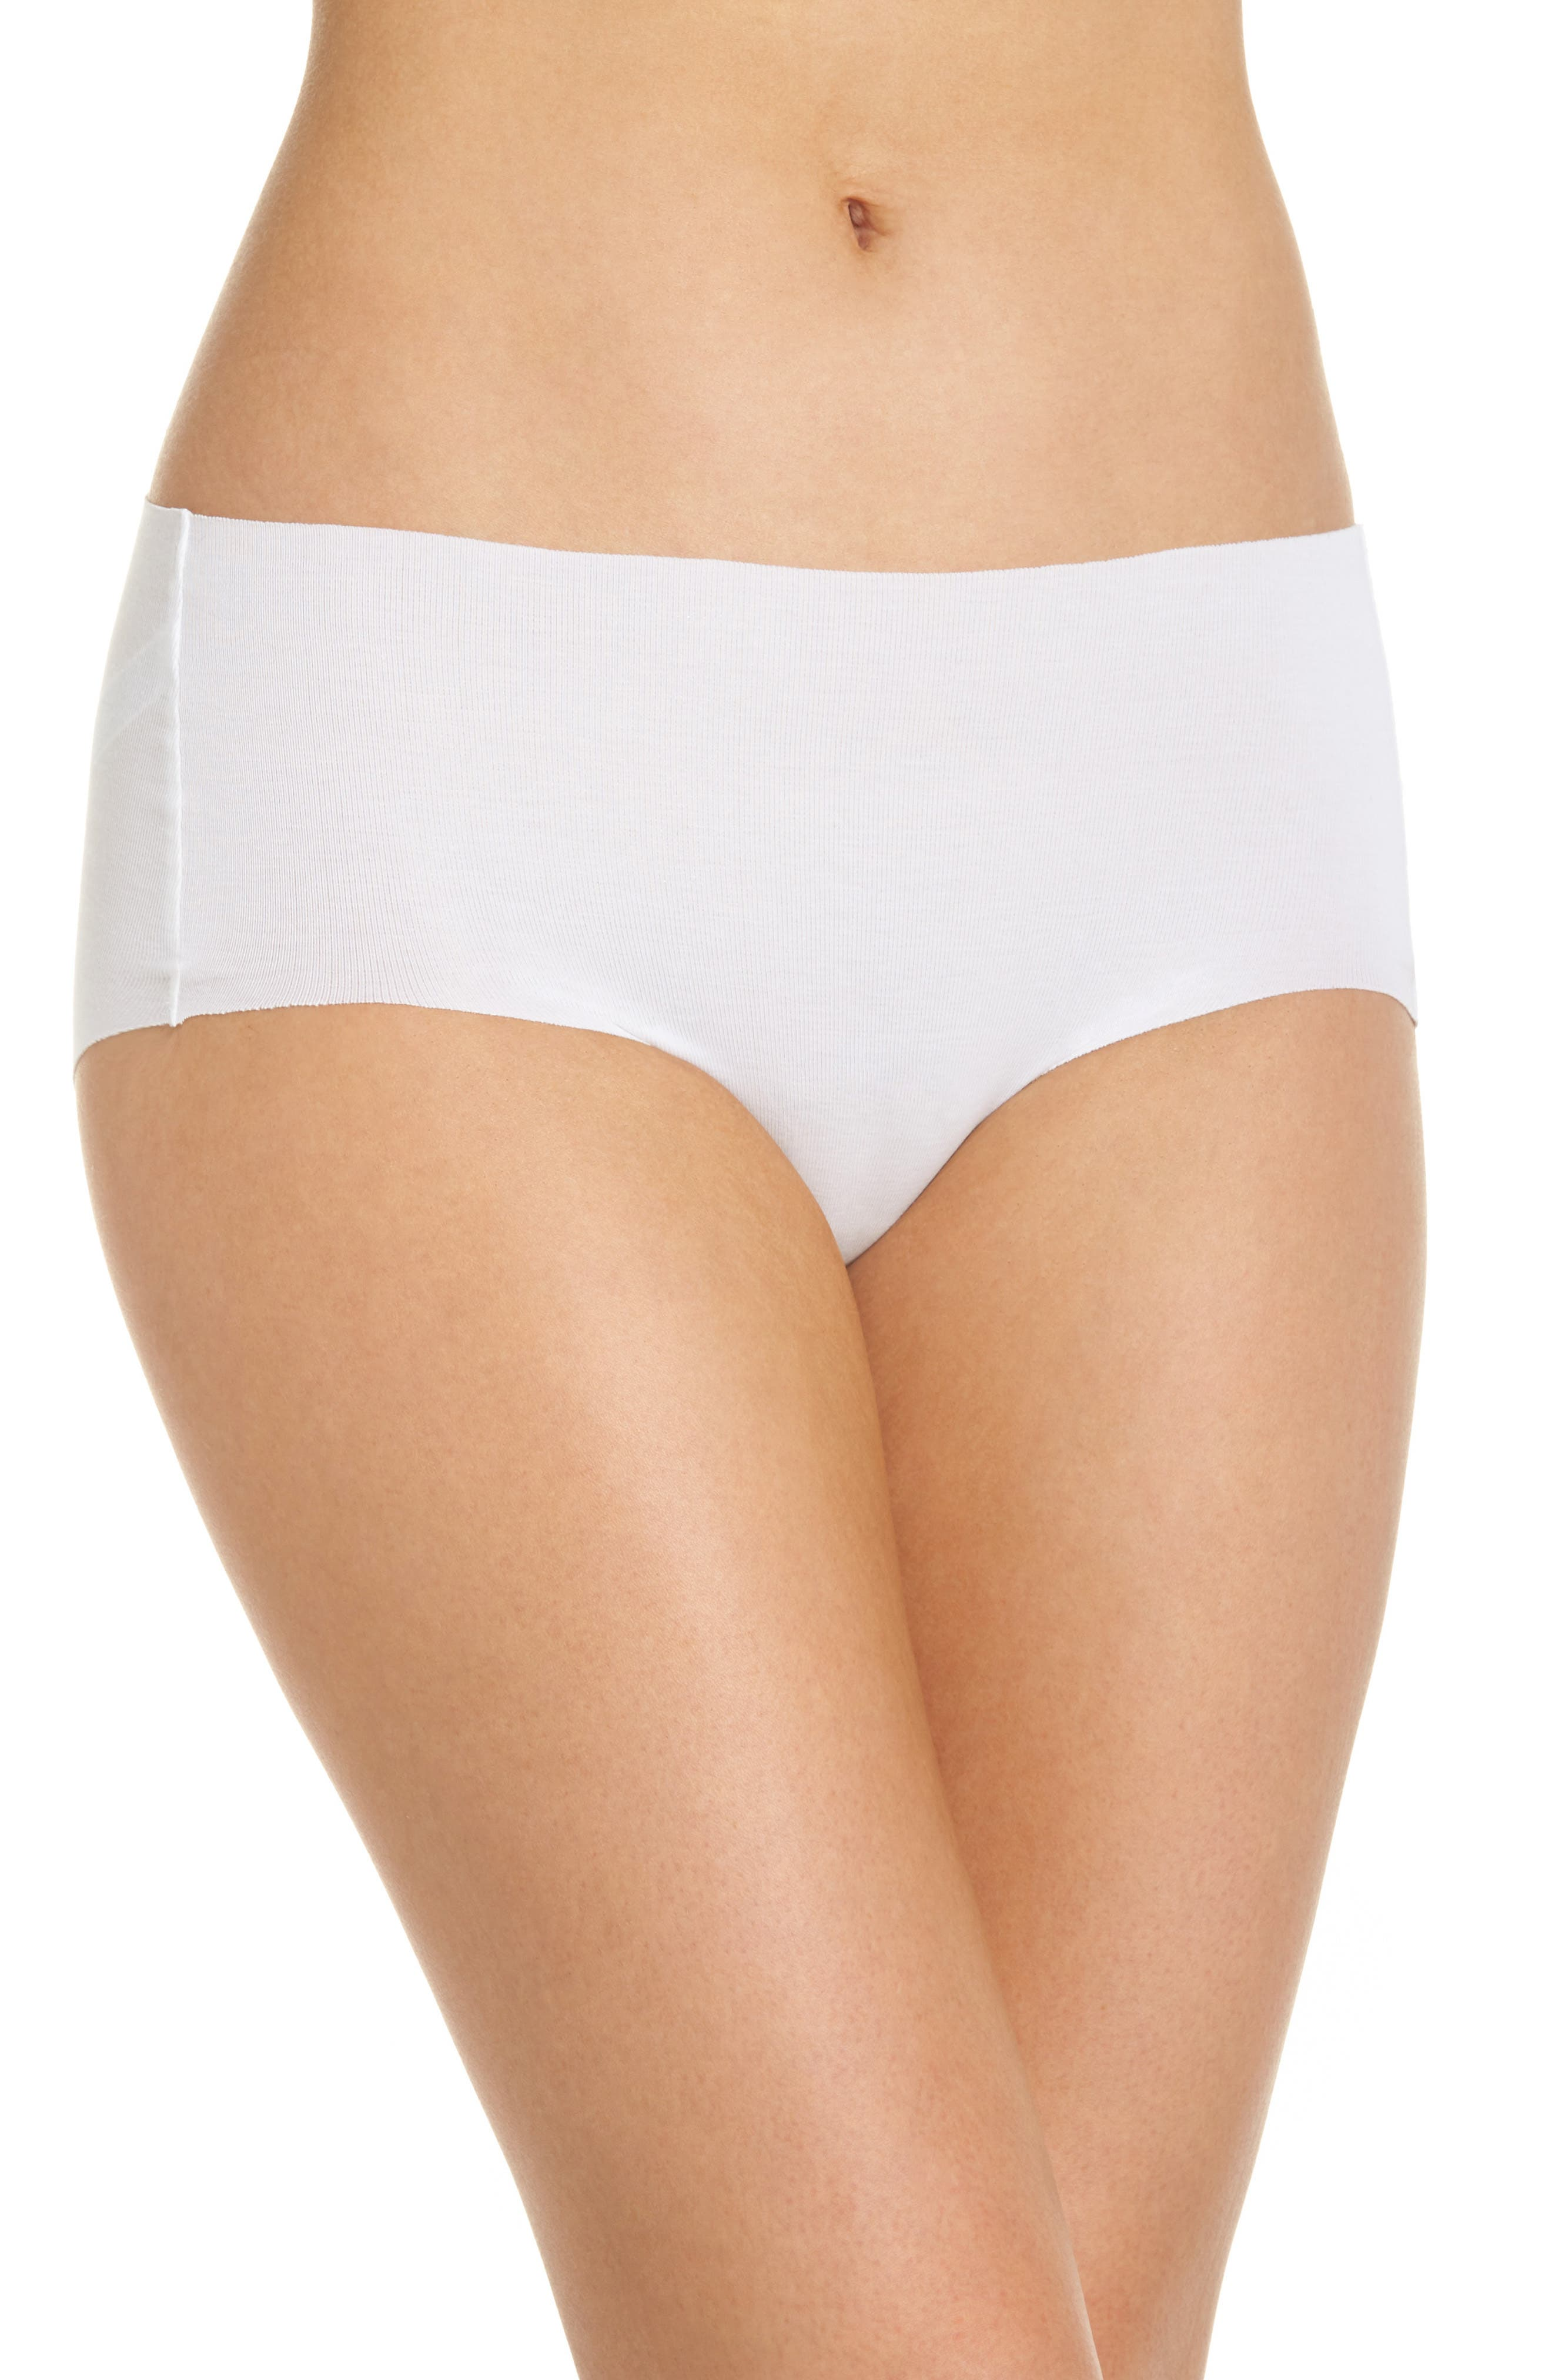 Tight white panty pics